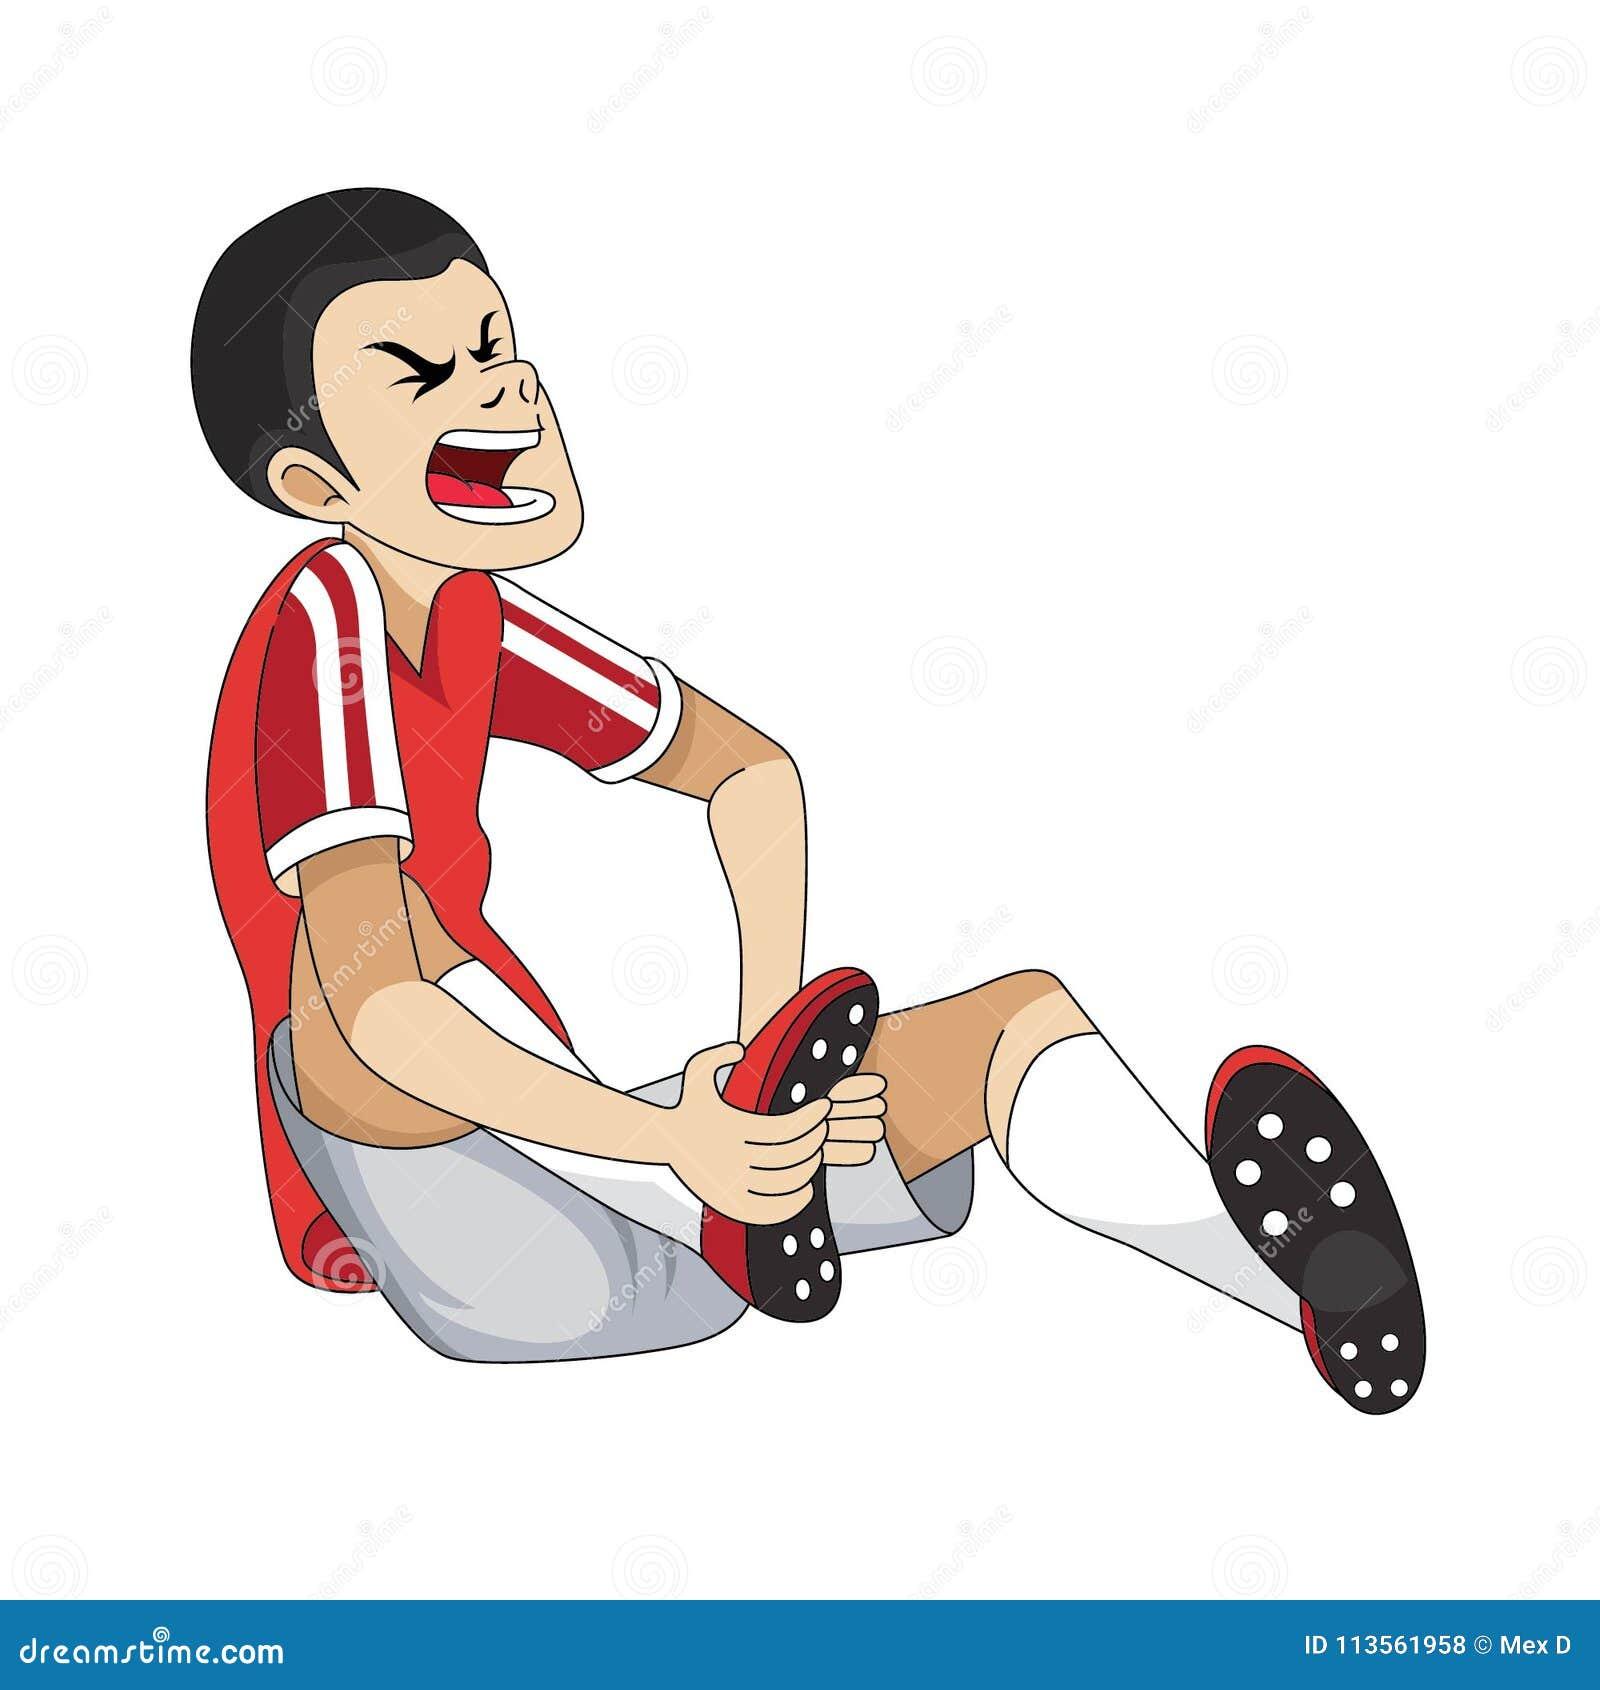 Soccer Player Injured Cartoon Stock Illustration Illustration Of Male Beautiful 113561958